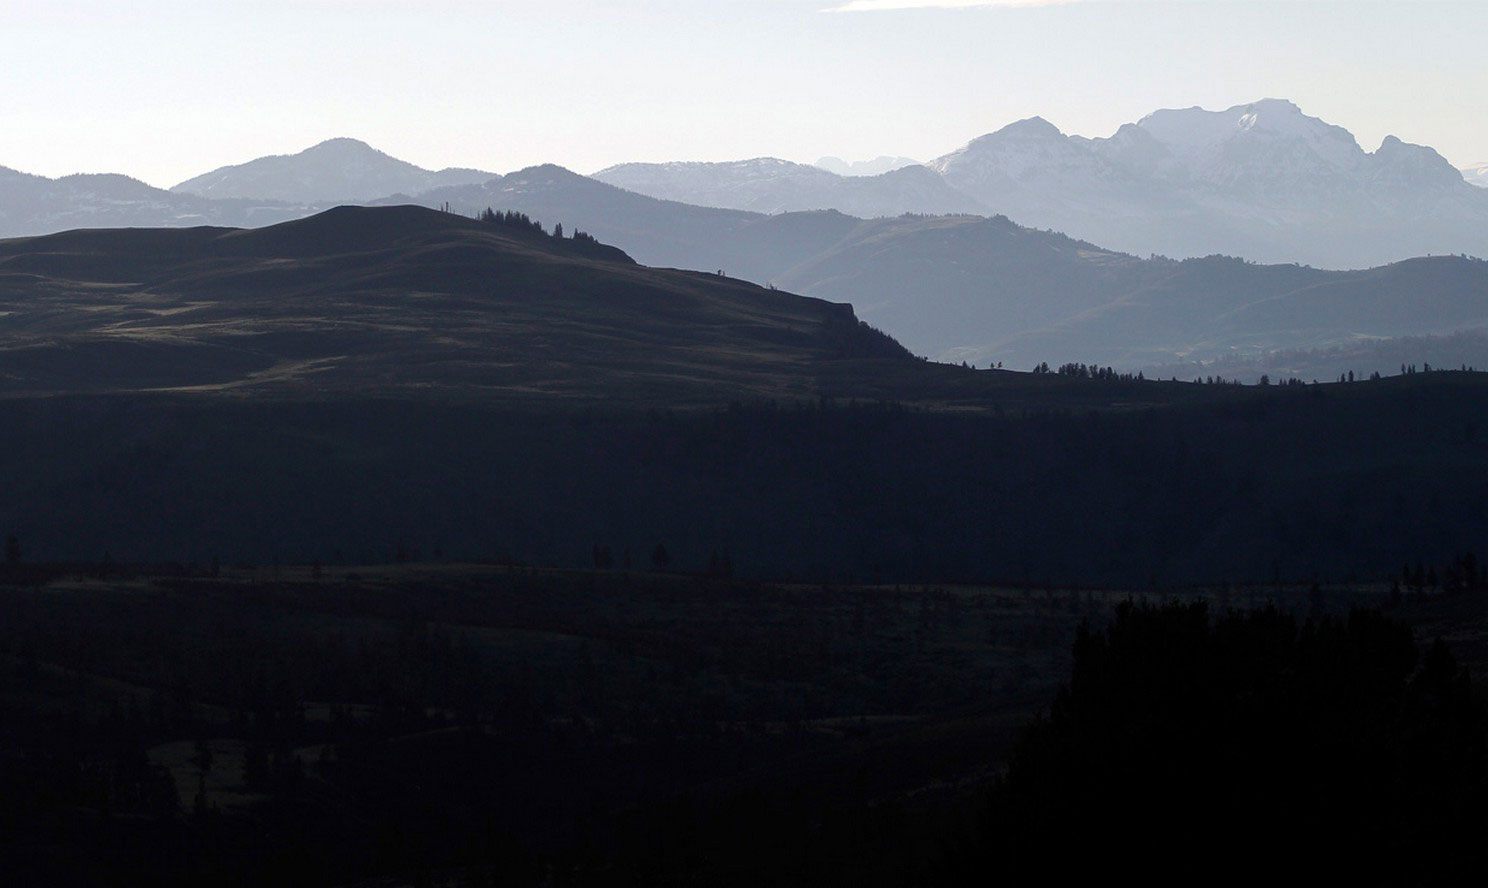 Горный хребет Абсарока